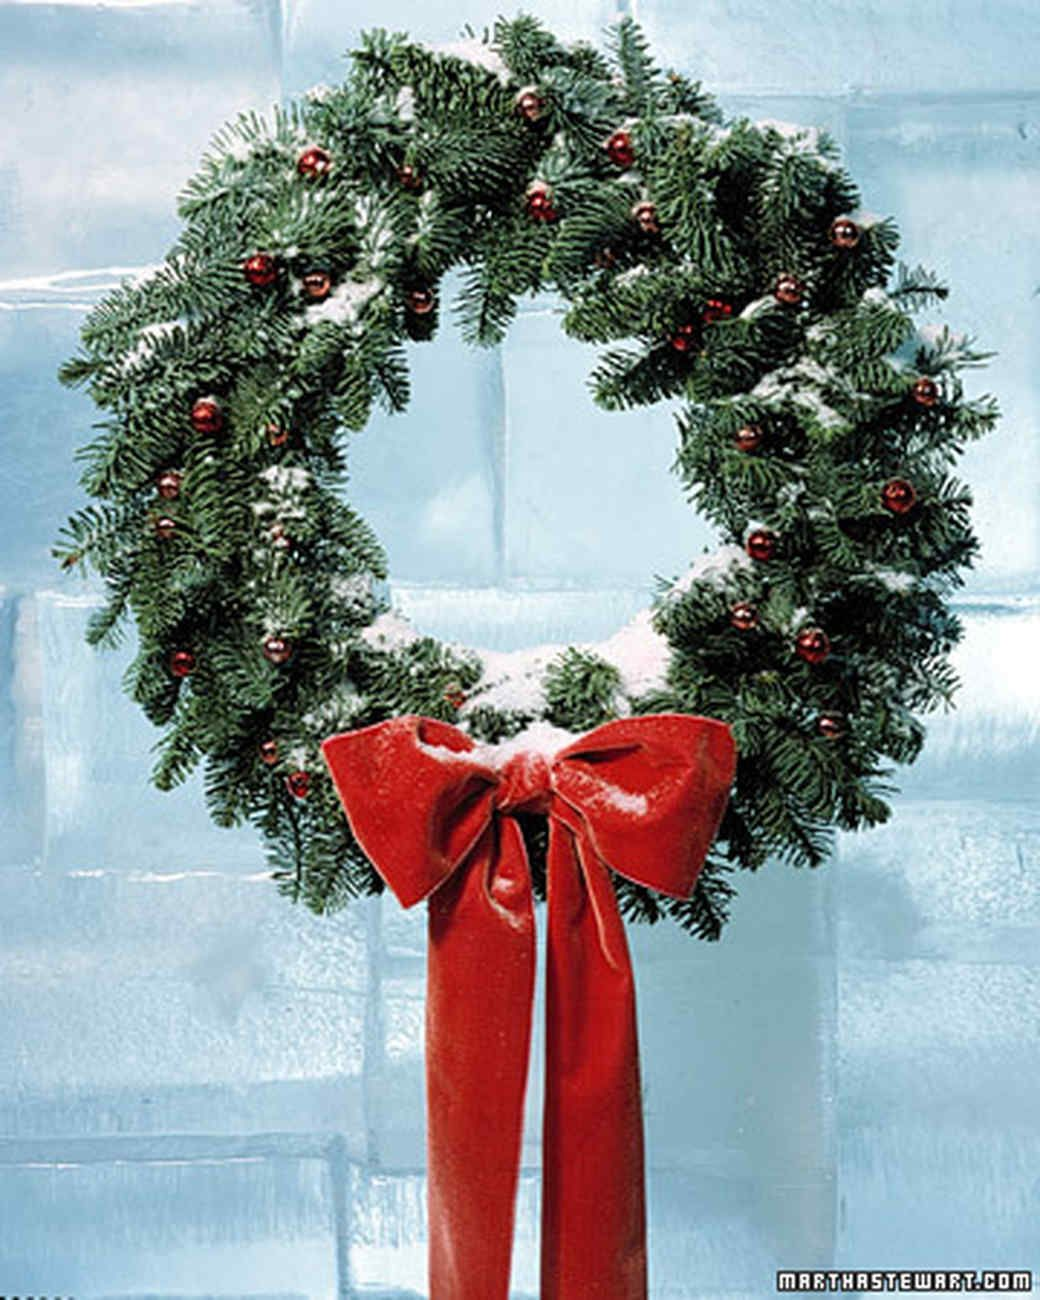 Bell wreath holly berries door wreaths and martha stewart bell wreath holiday decor ideas martha stewart living festive red bells mimic the seasons solutioingenieria Image collections